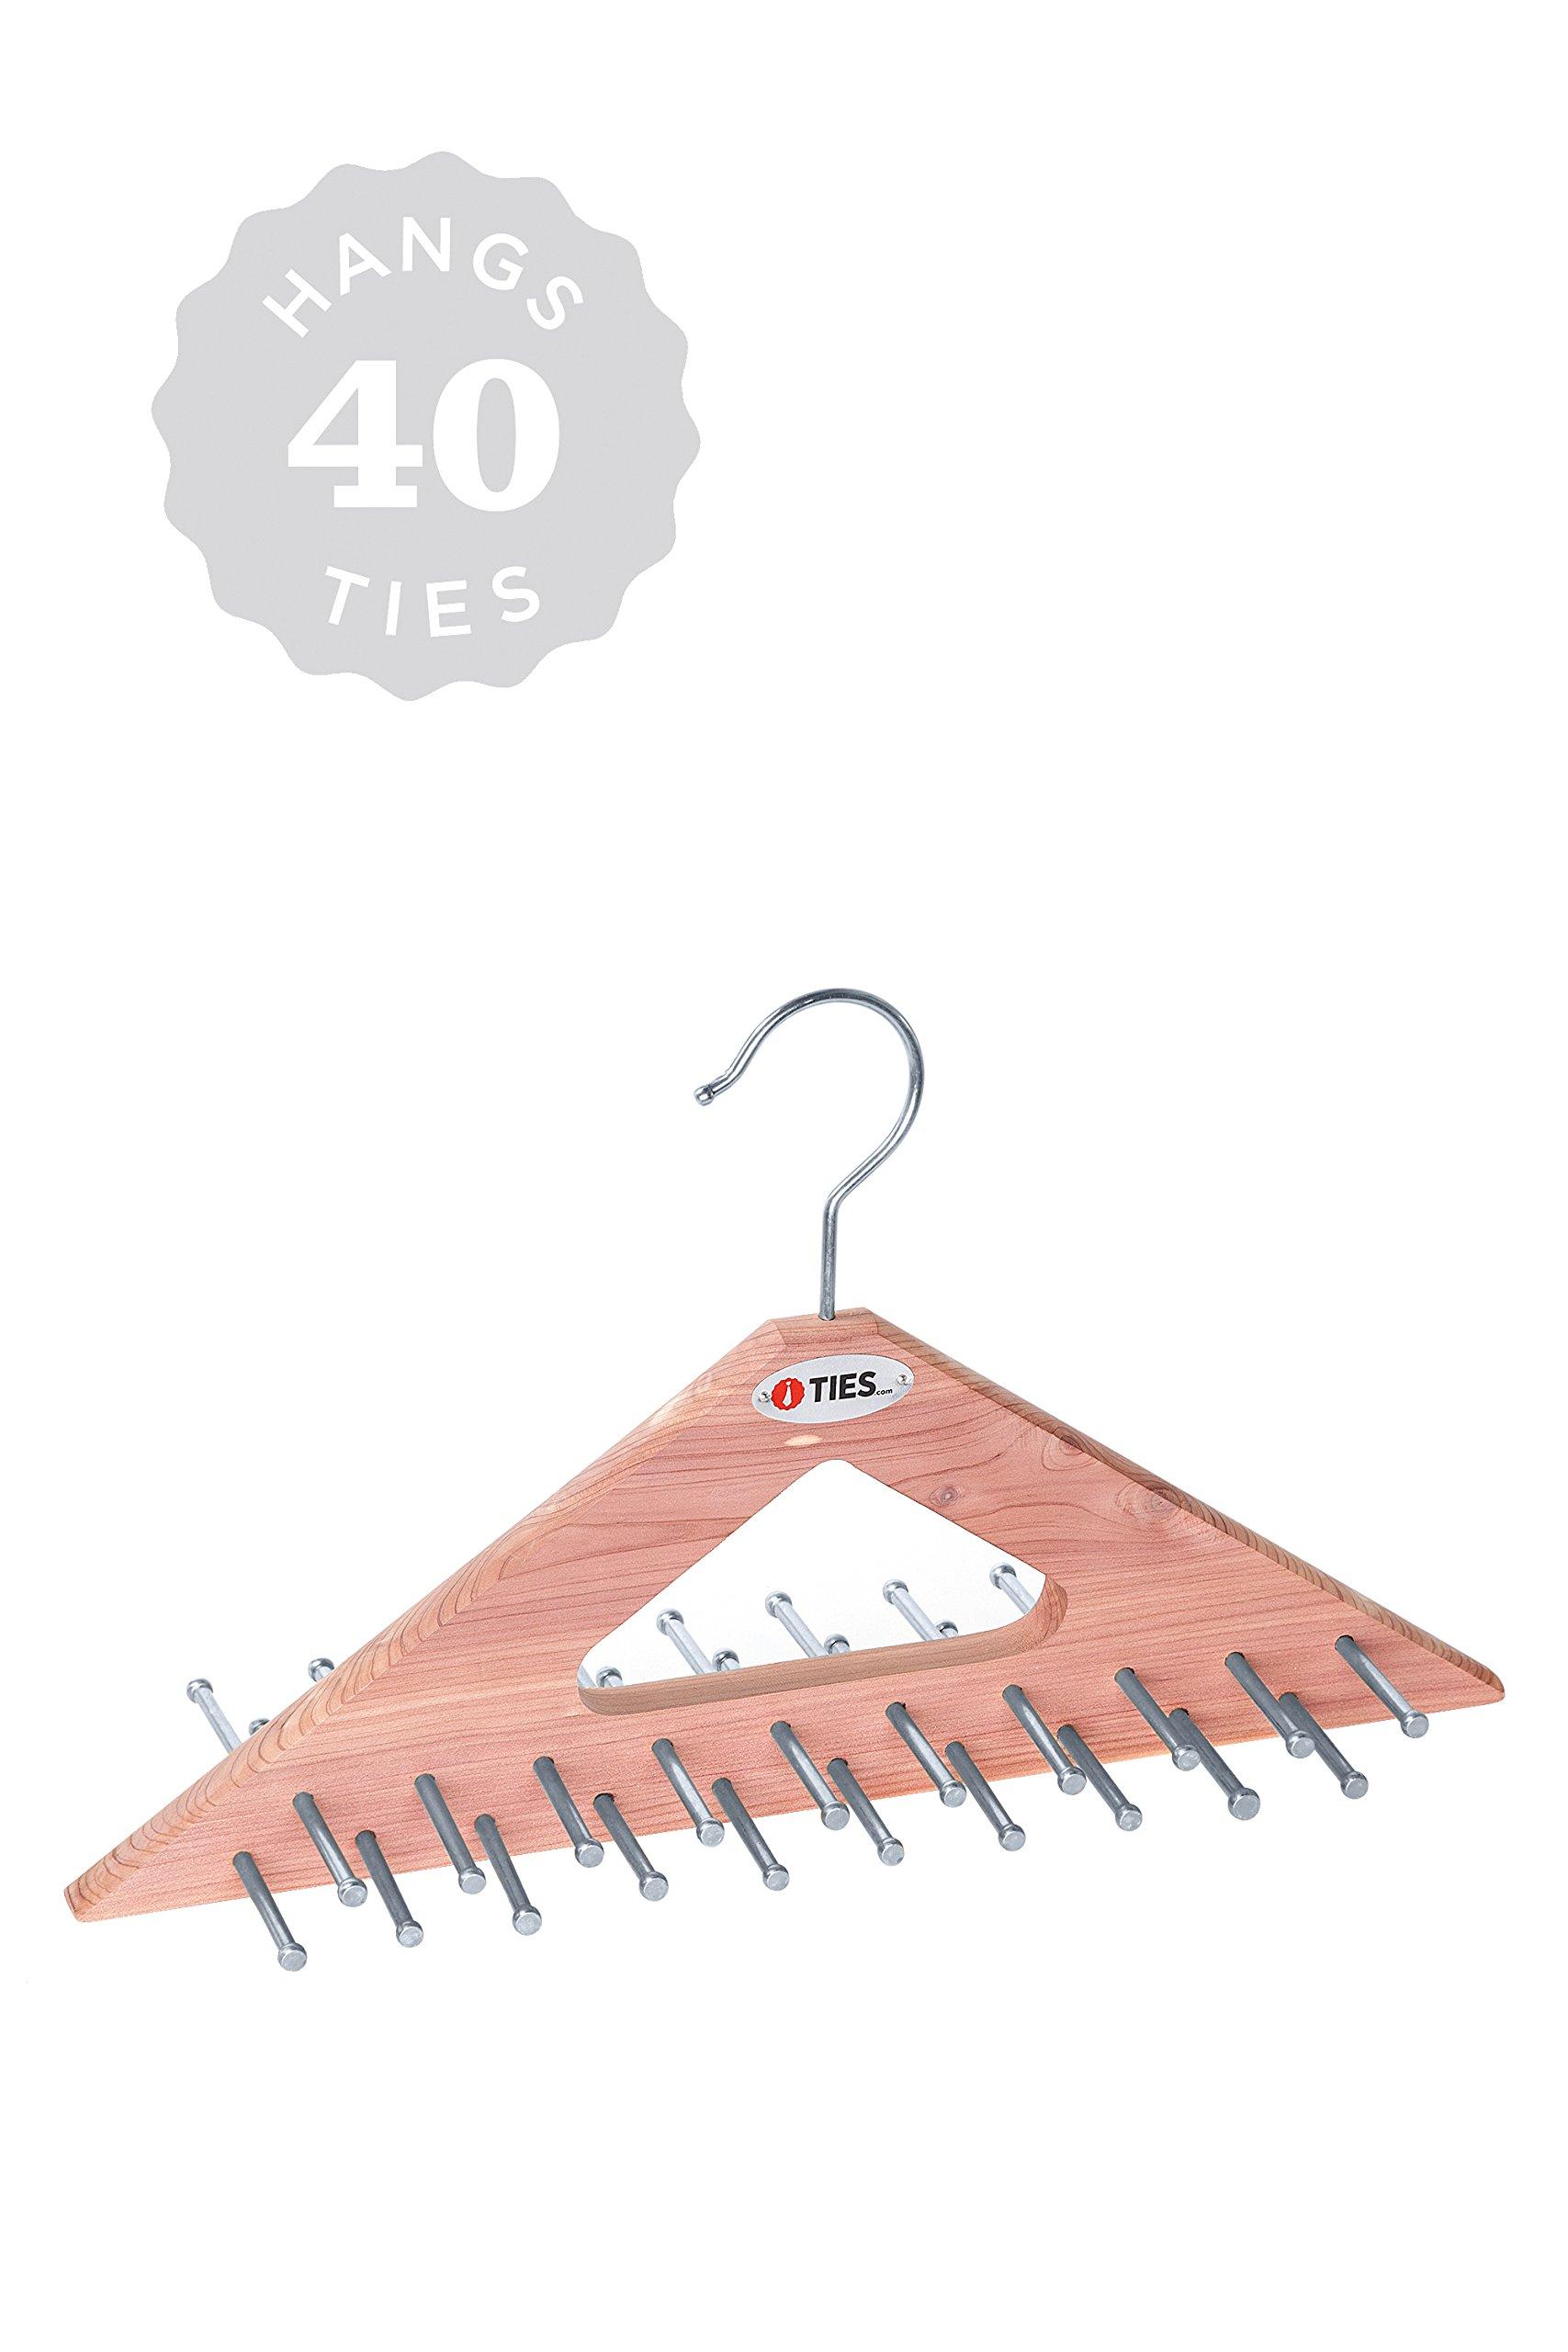 Handmade 100% Natural Aromatic Cedar Wooden Peg Tie and Belt Rack Closet Hanger (40 Ties)